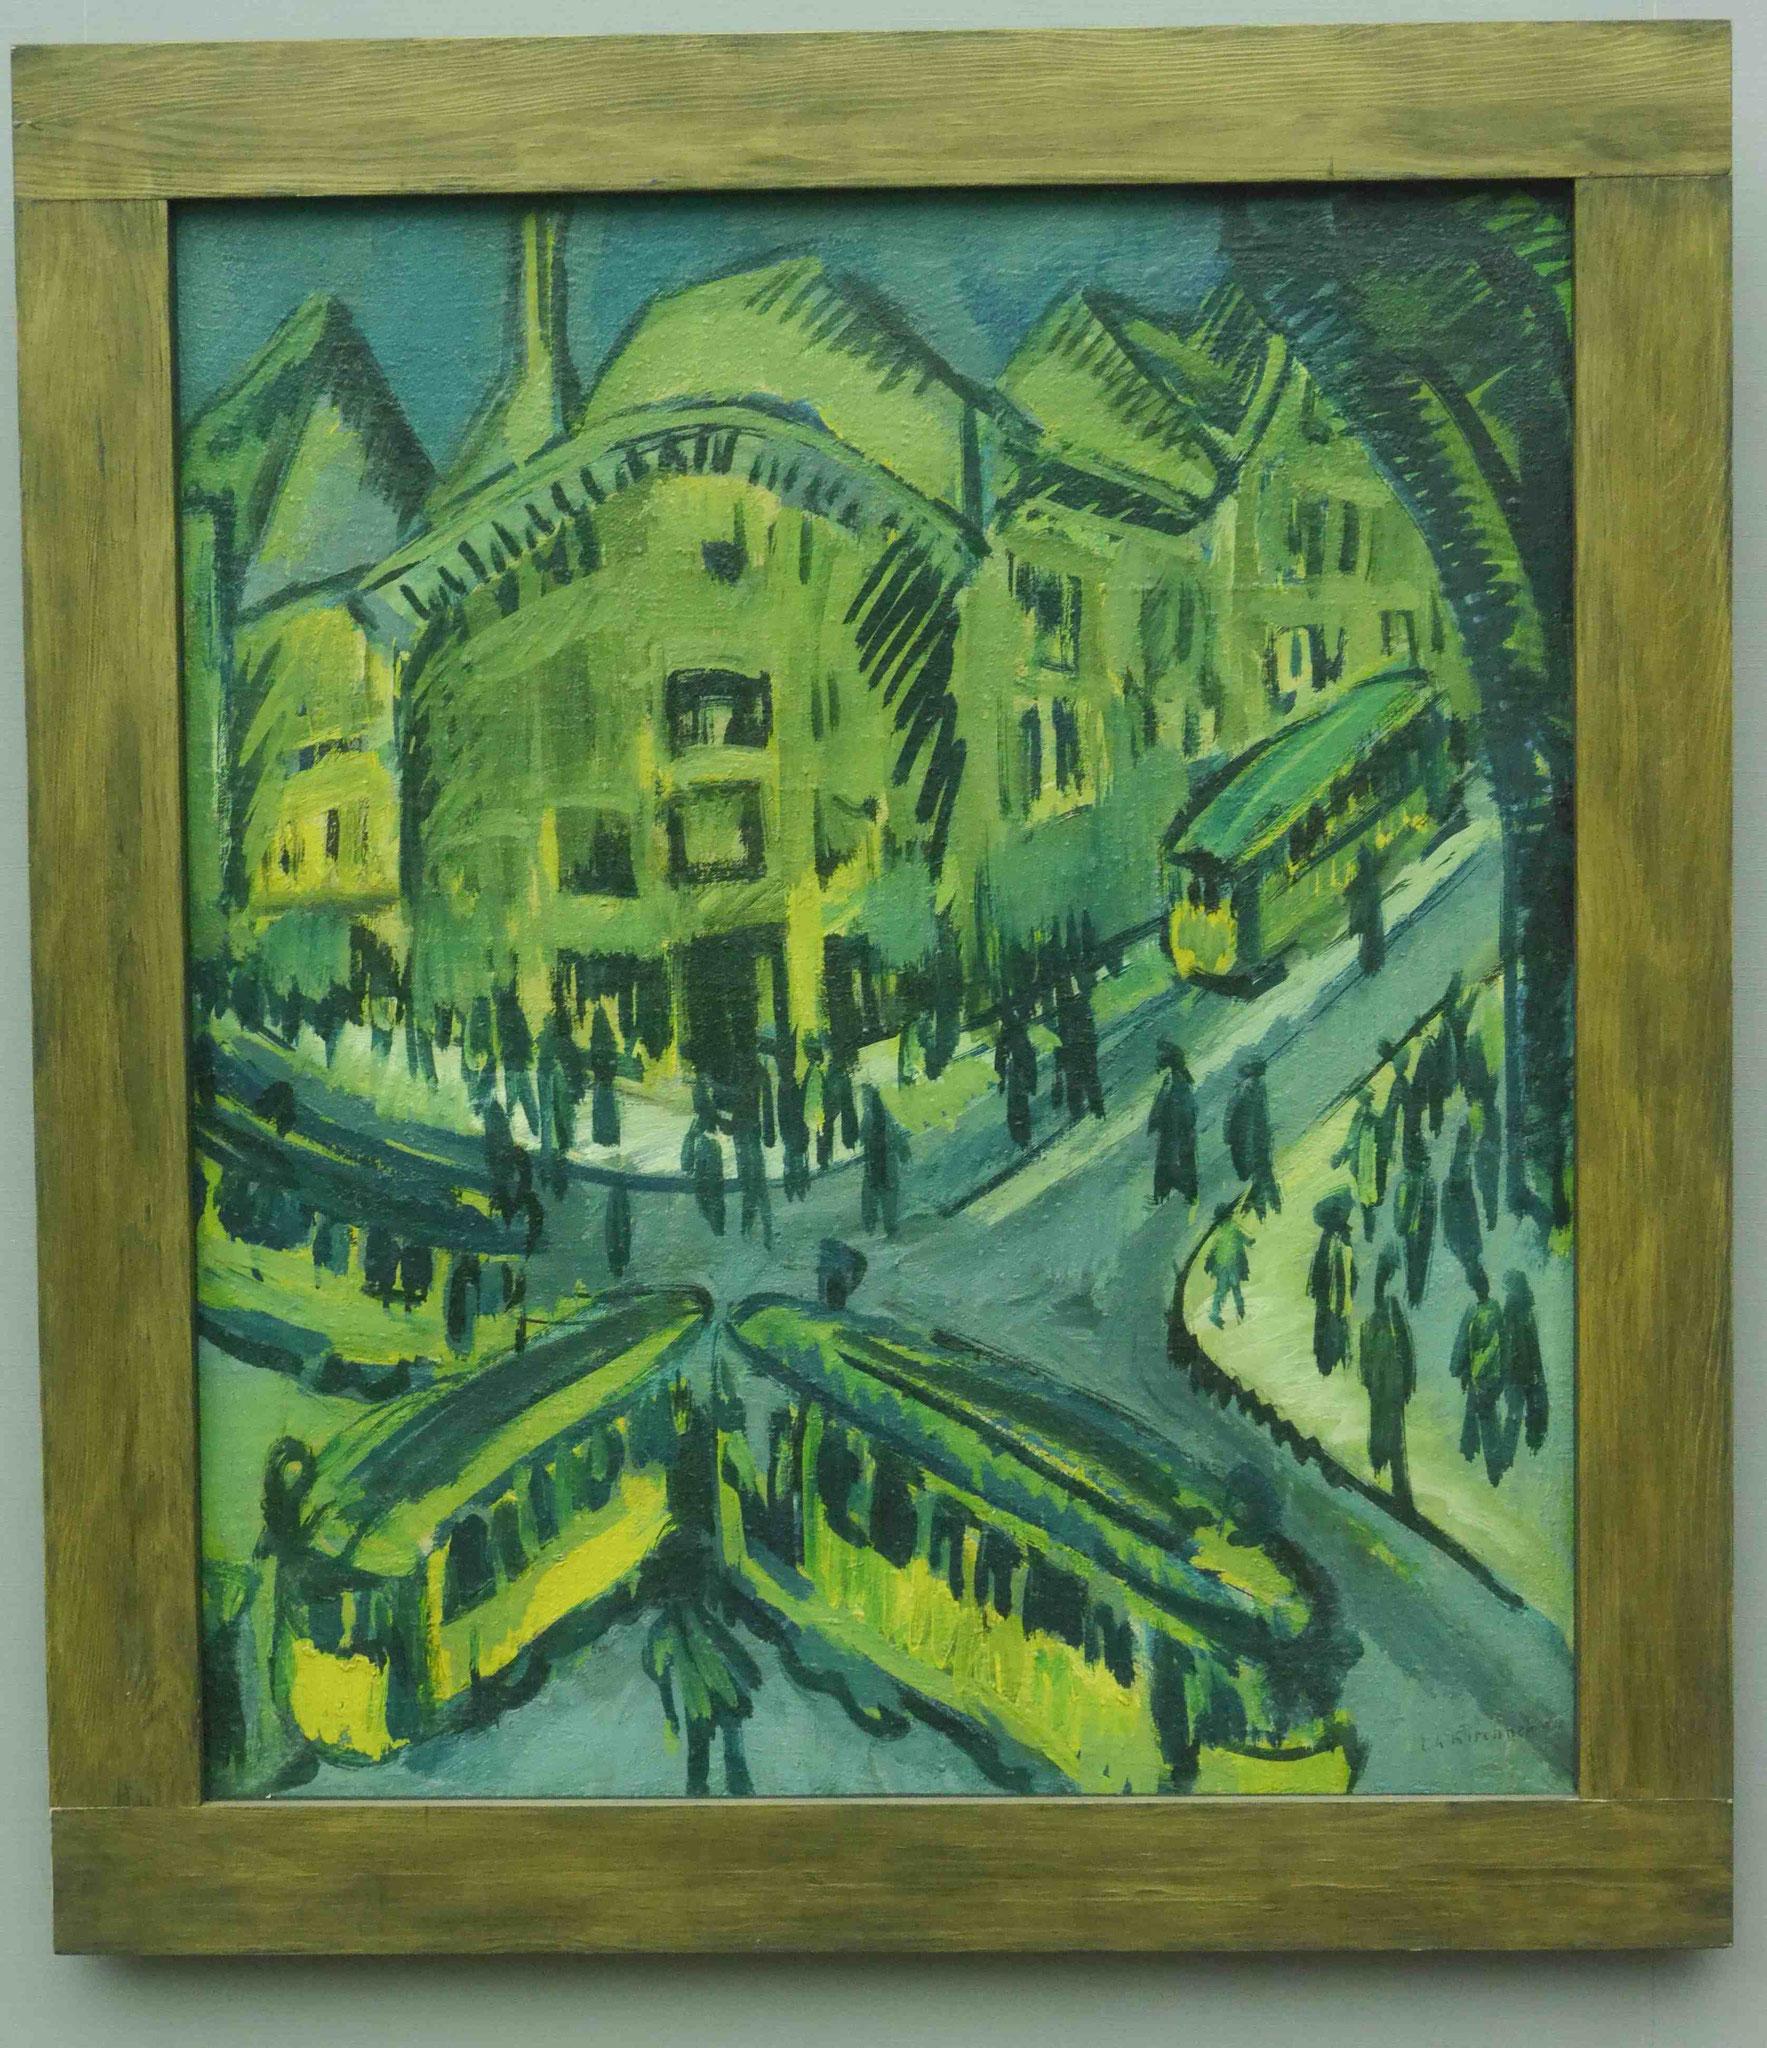 Ernst Ludwig Kirchner, ImEx, Stiftung Stadtmuseum Berlin